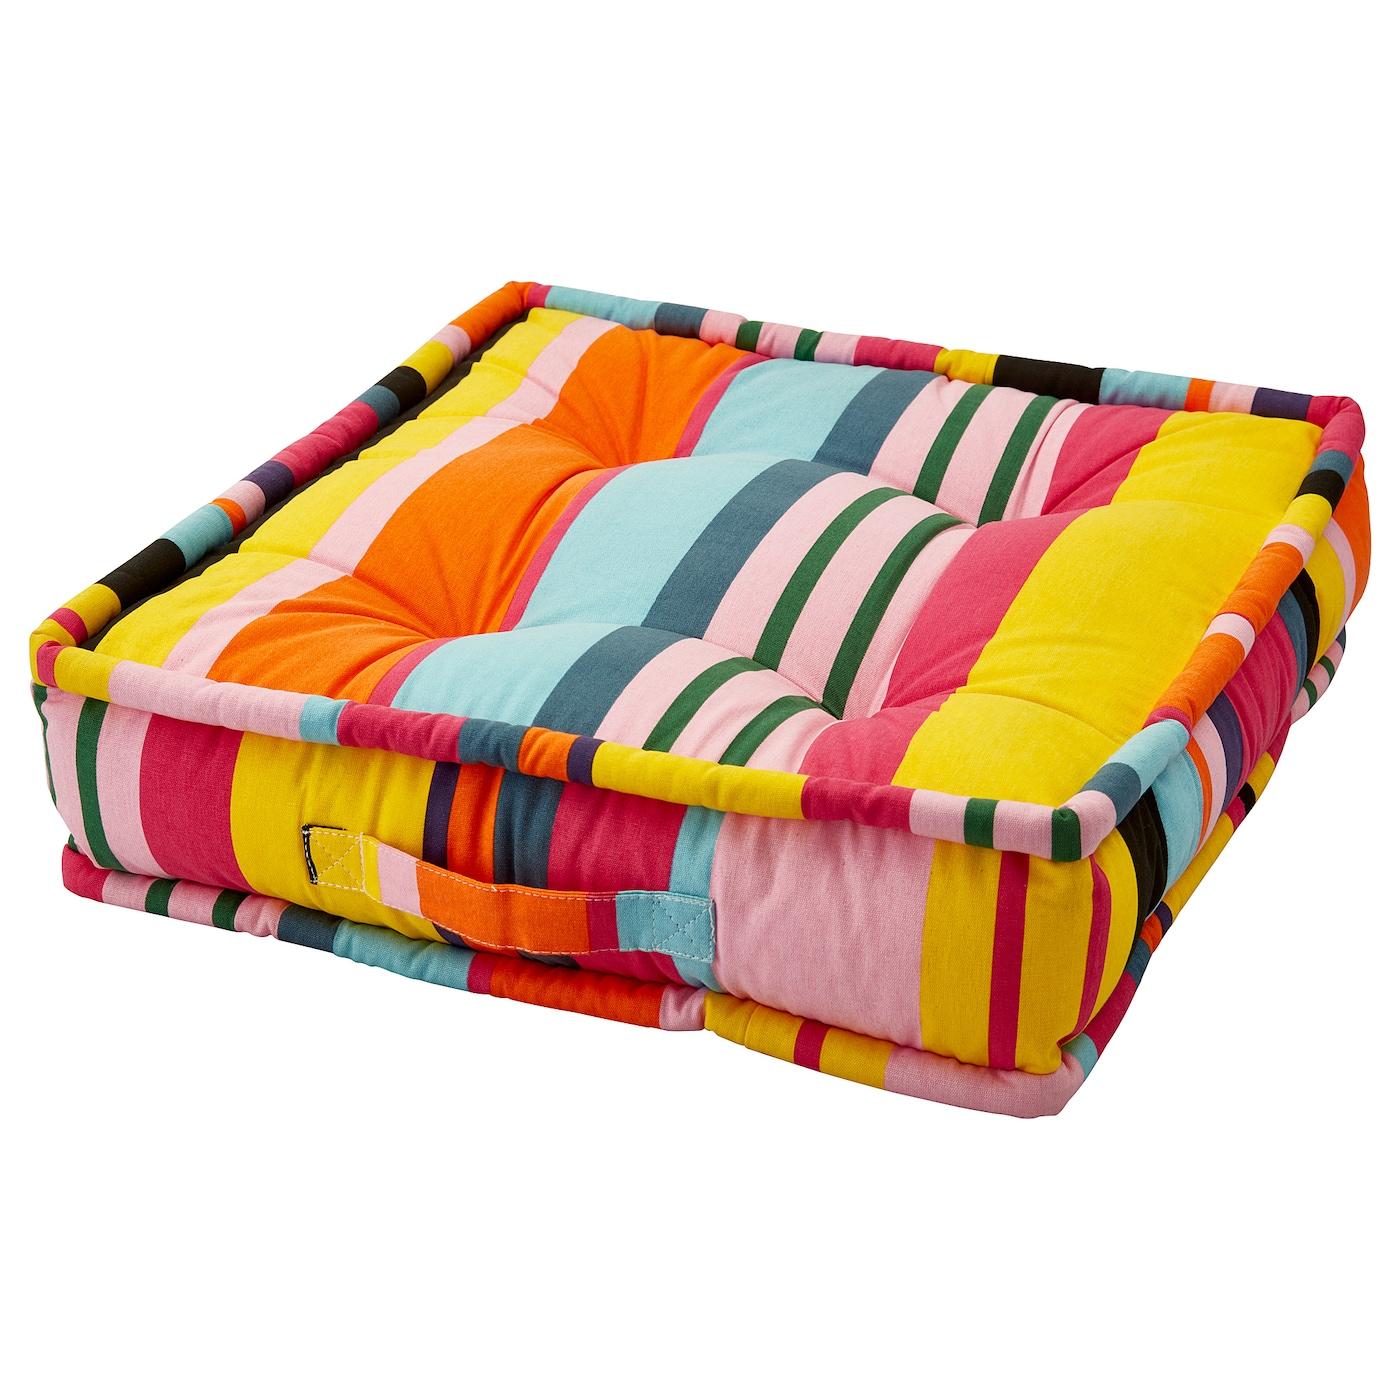 Ursprunglig Cojin Suelo Raya 45 X 45 X 10 Cm Ikea